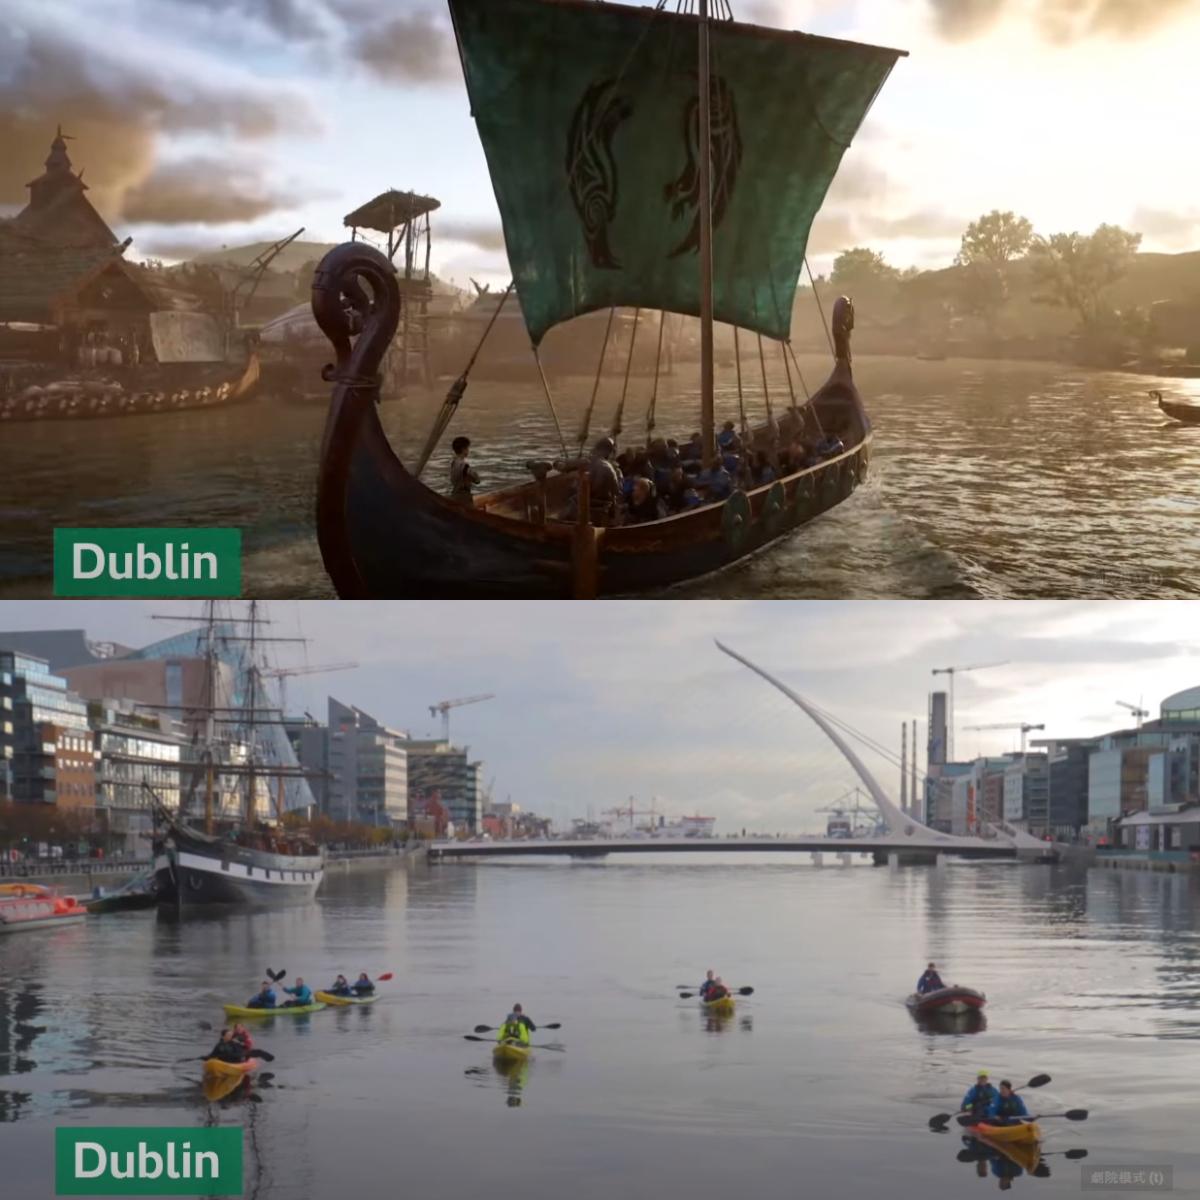 愛爾蘭首府都柏林。 圖:翻攝自Discover Ireland YouTube